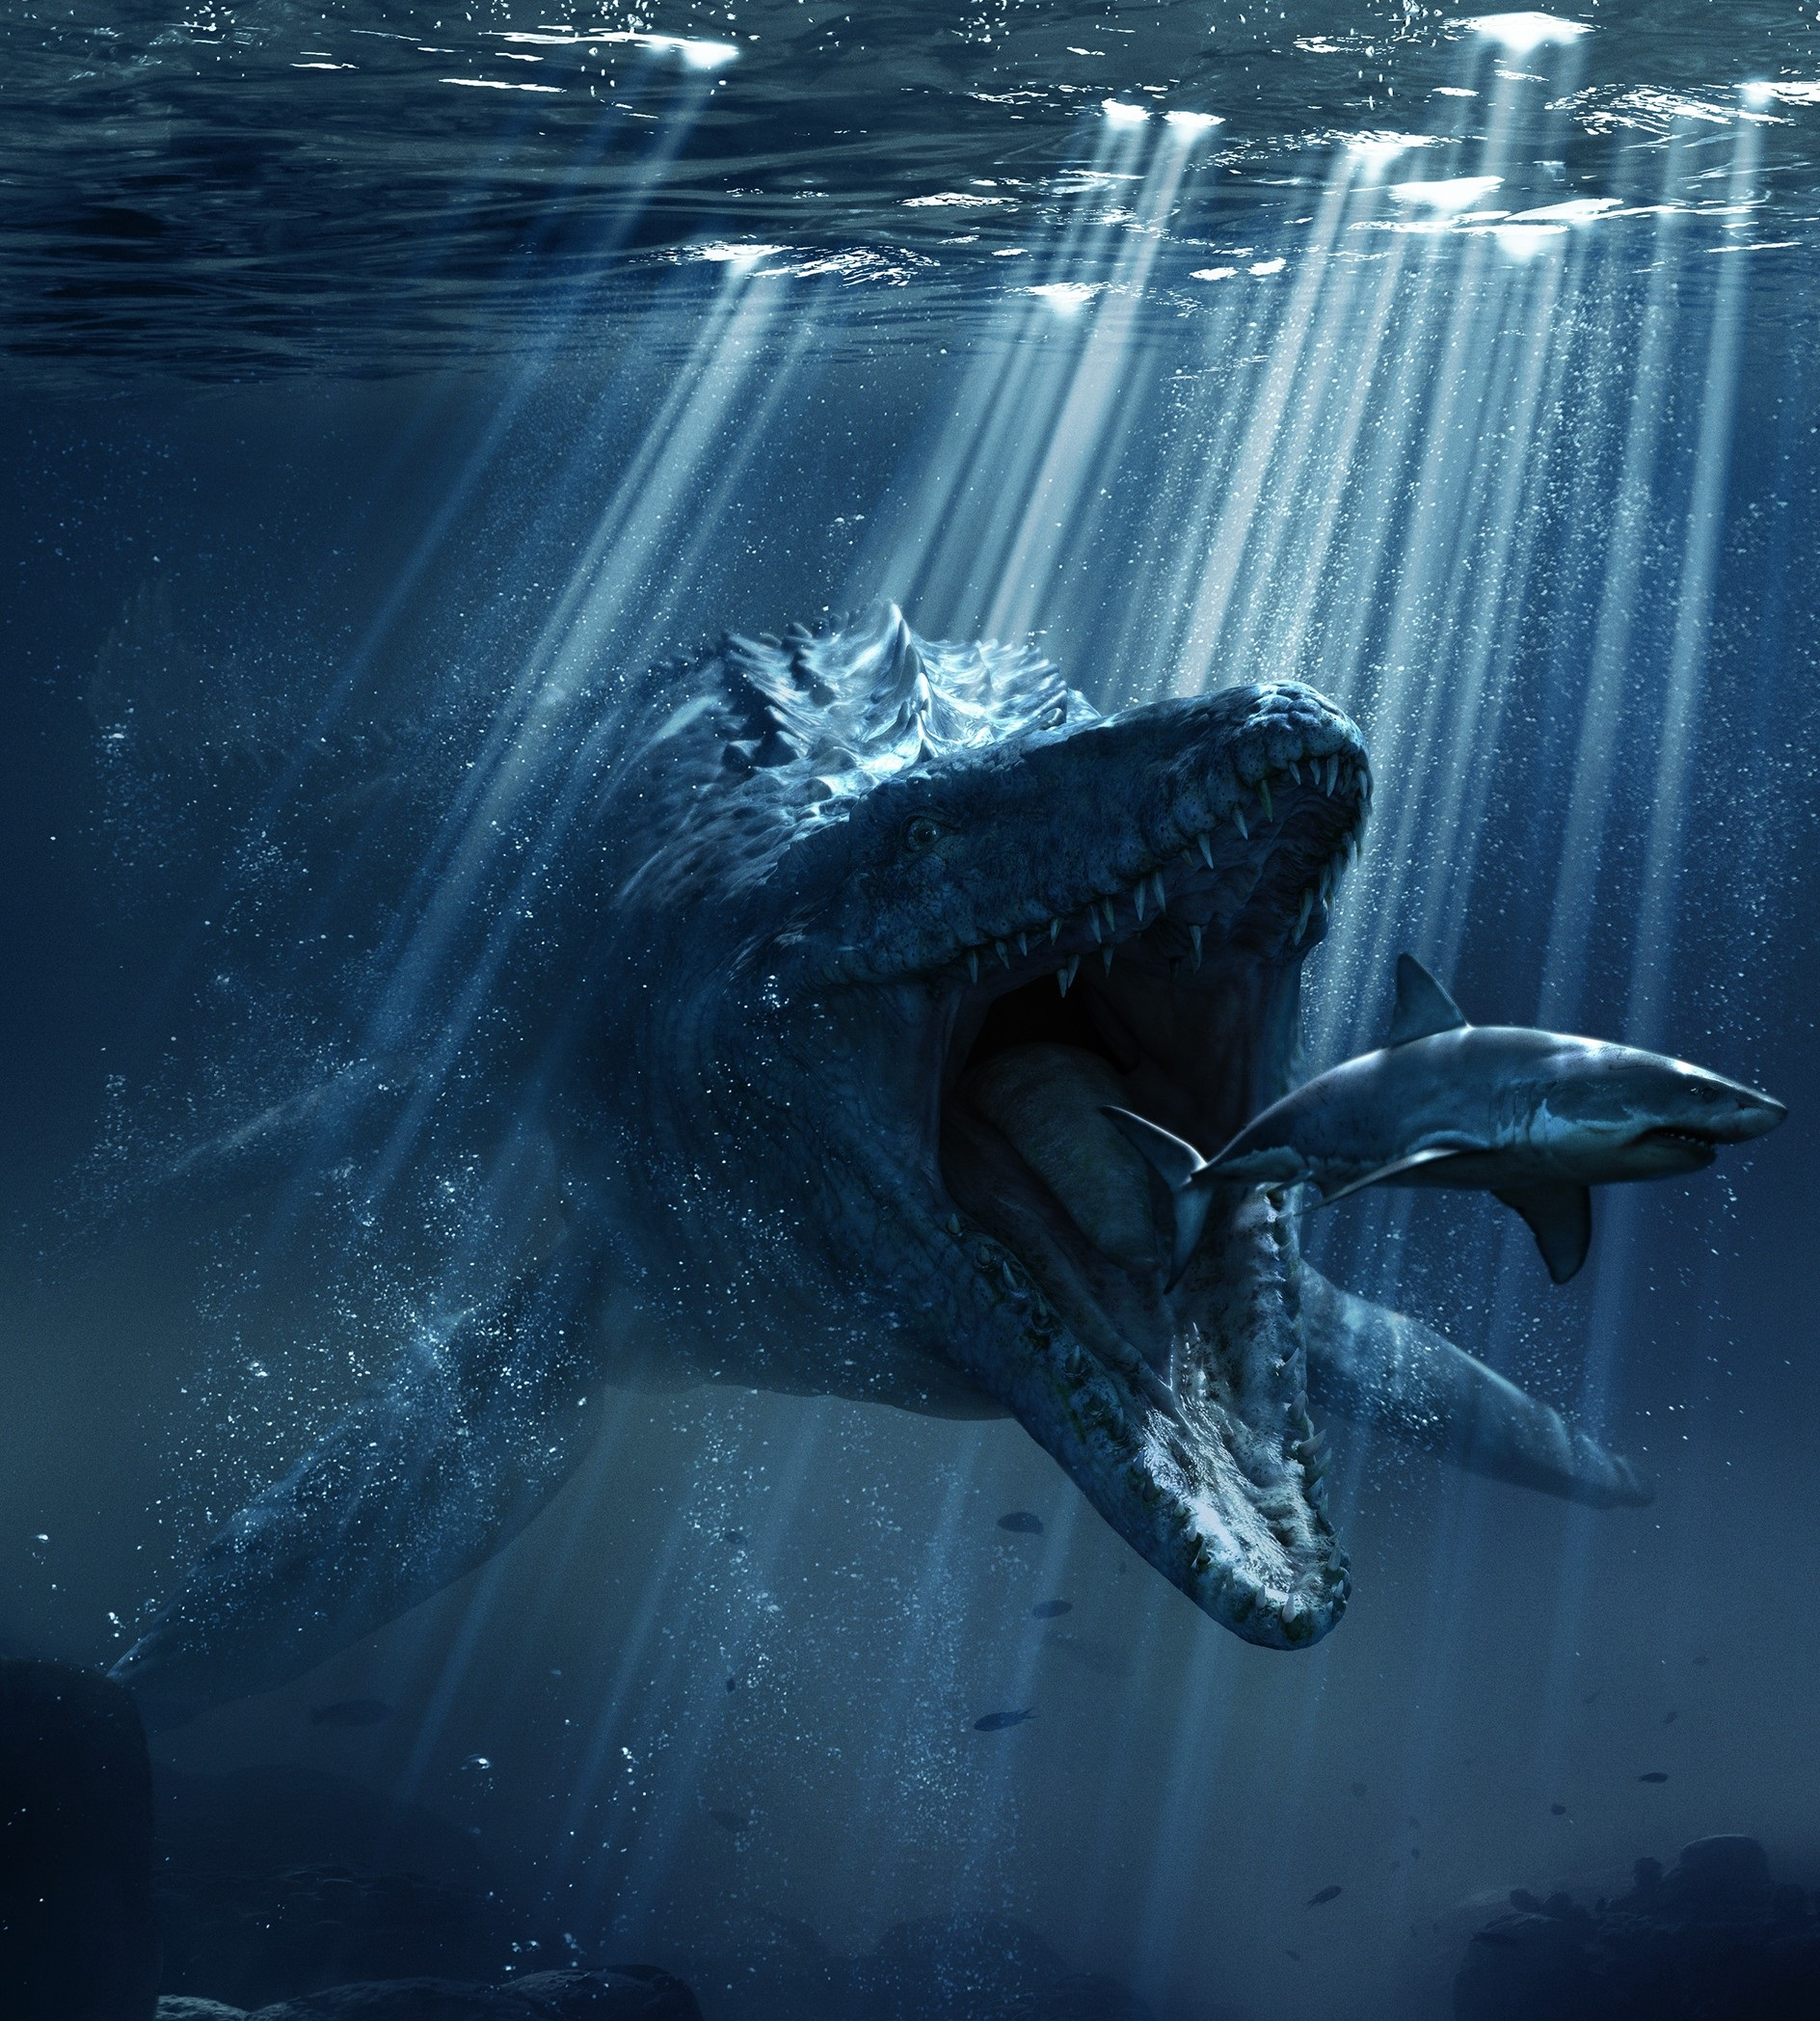 mosasaurus jurassic world vs battles wiki fandom